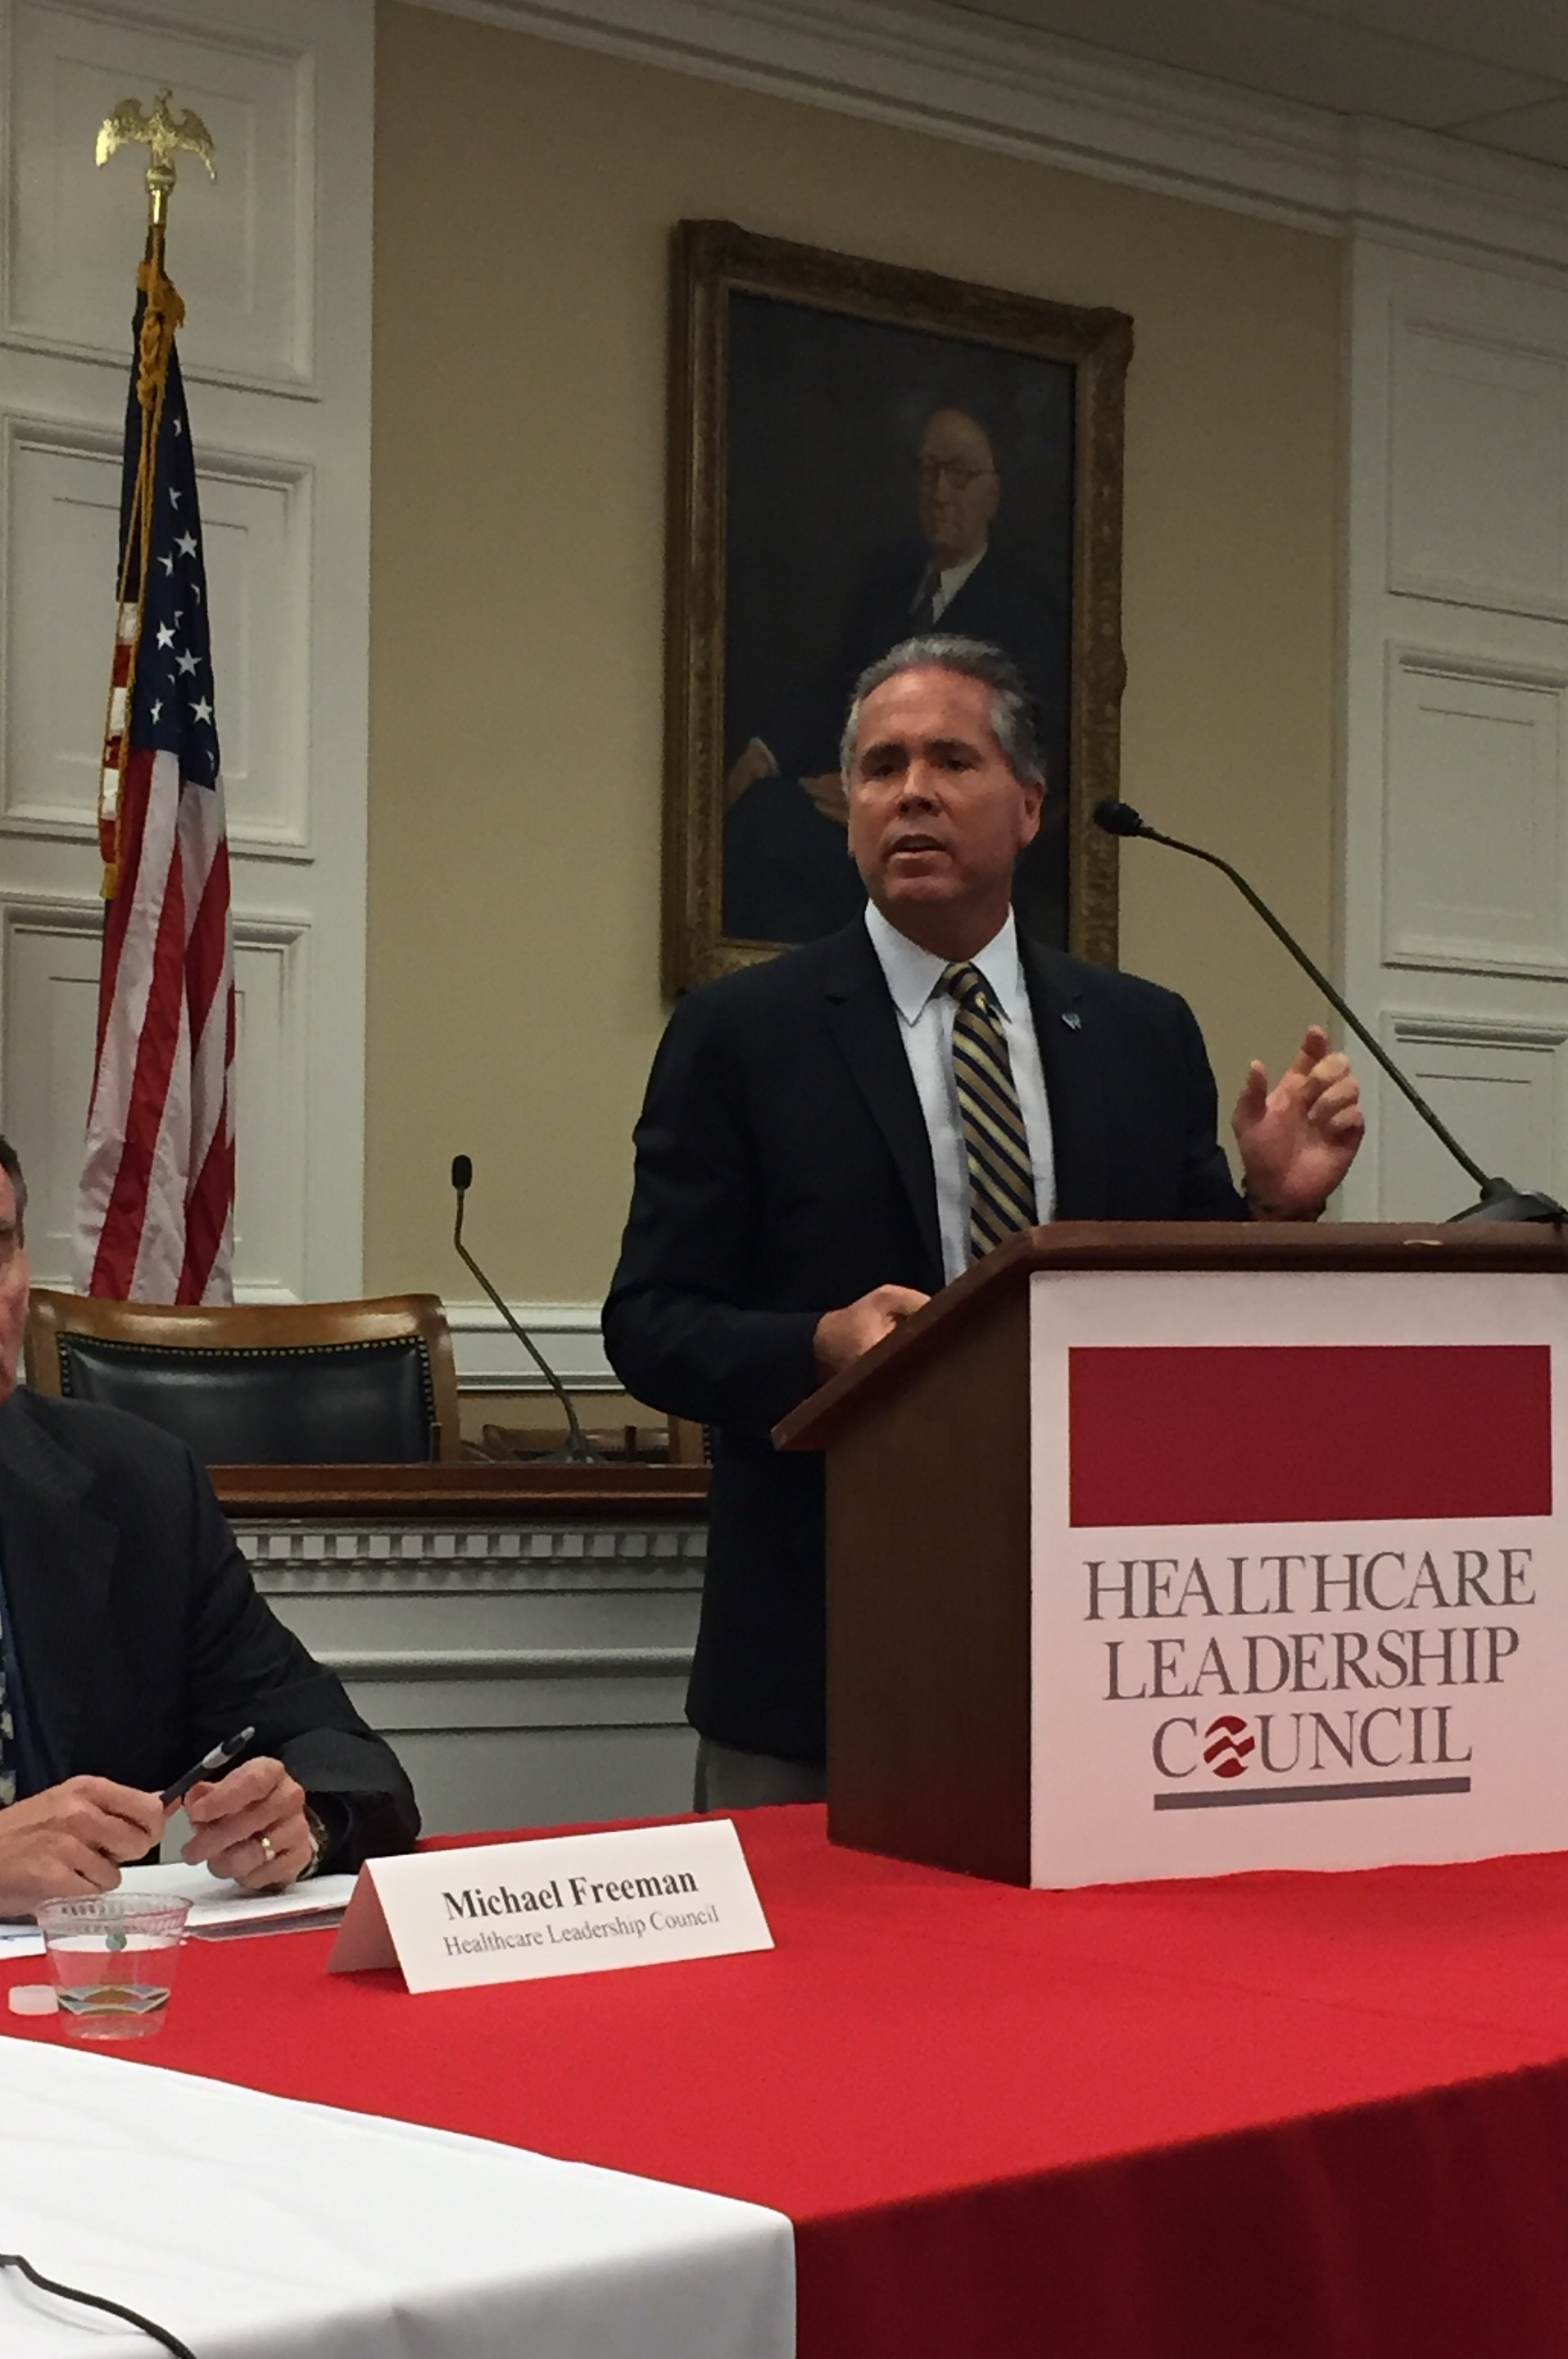 Steve Wehn, AMN Healthcare